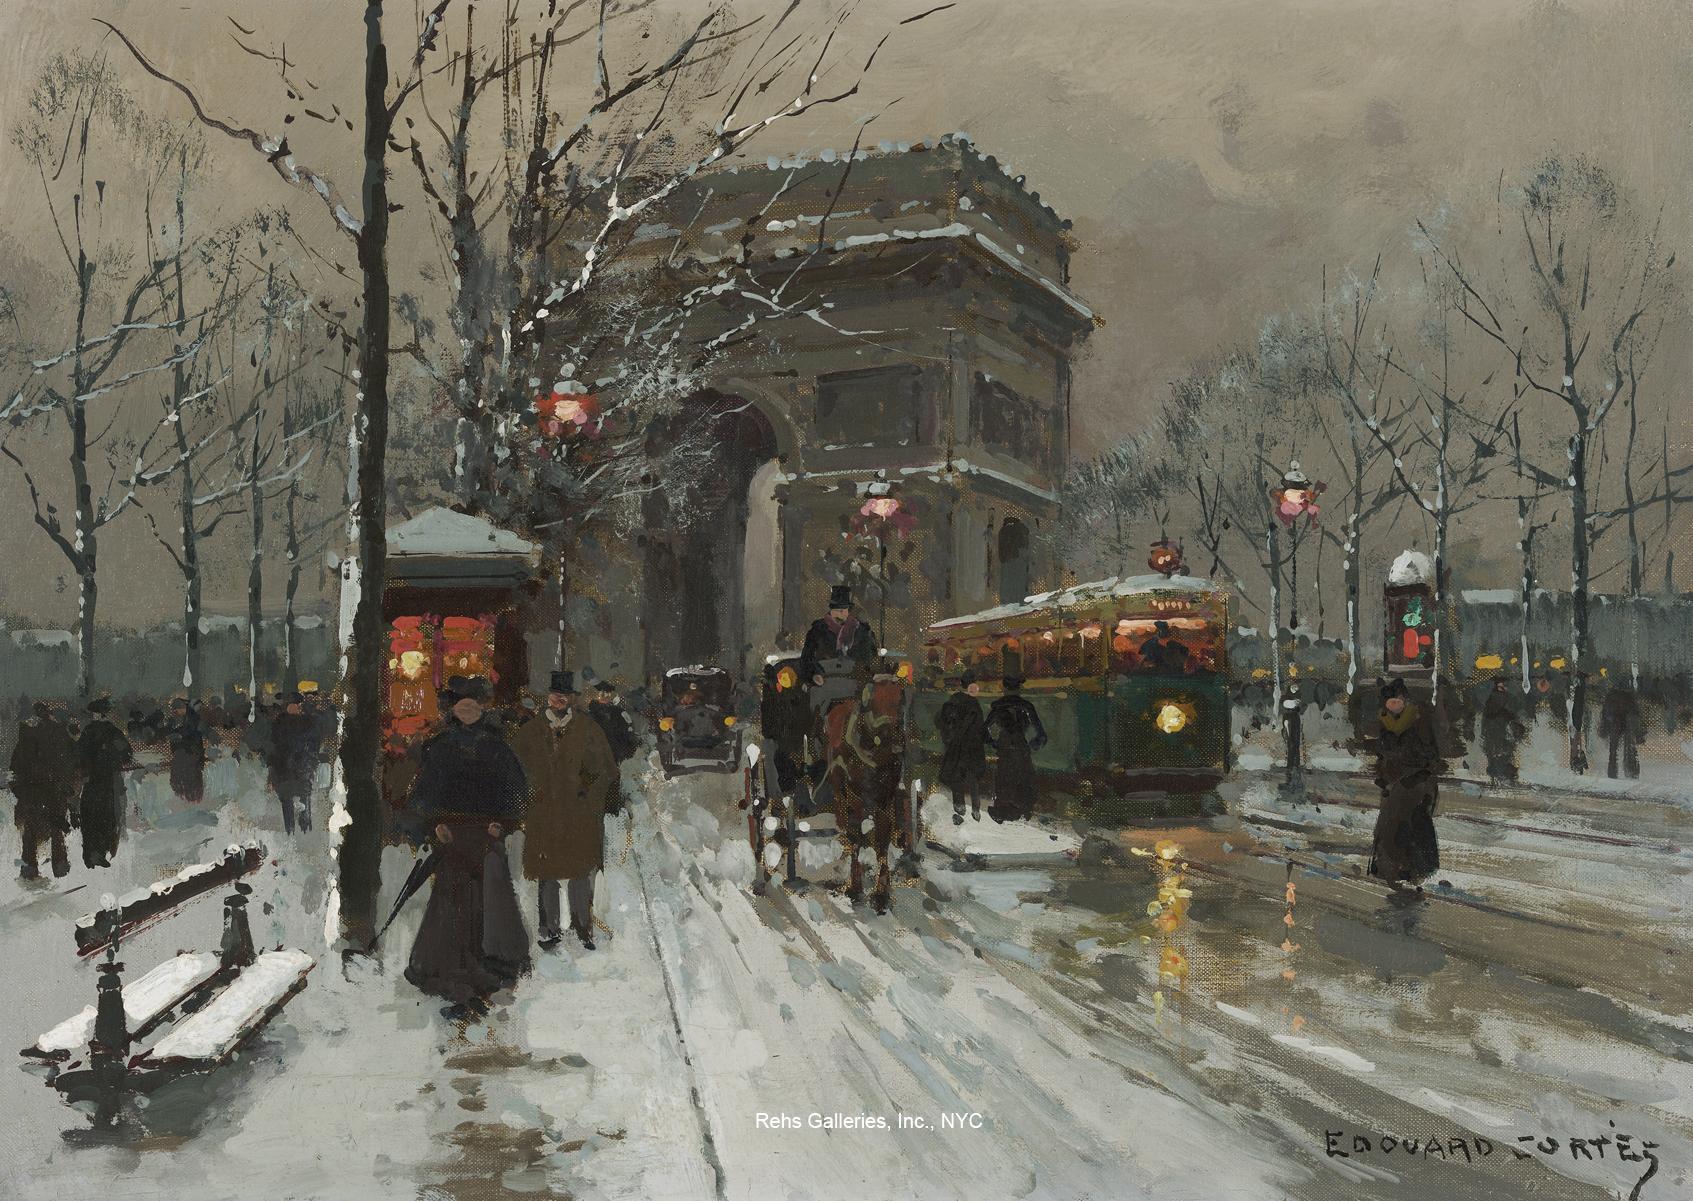 edouard_leon_cortes_e1237_arc_de_triomphe_winter_wm.jpg